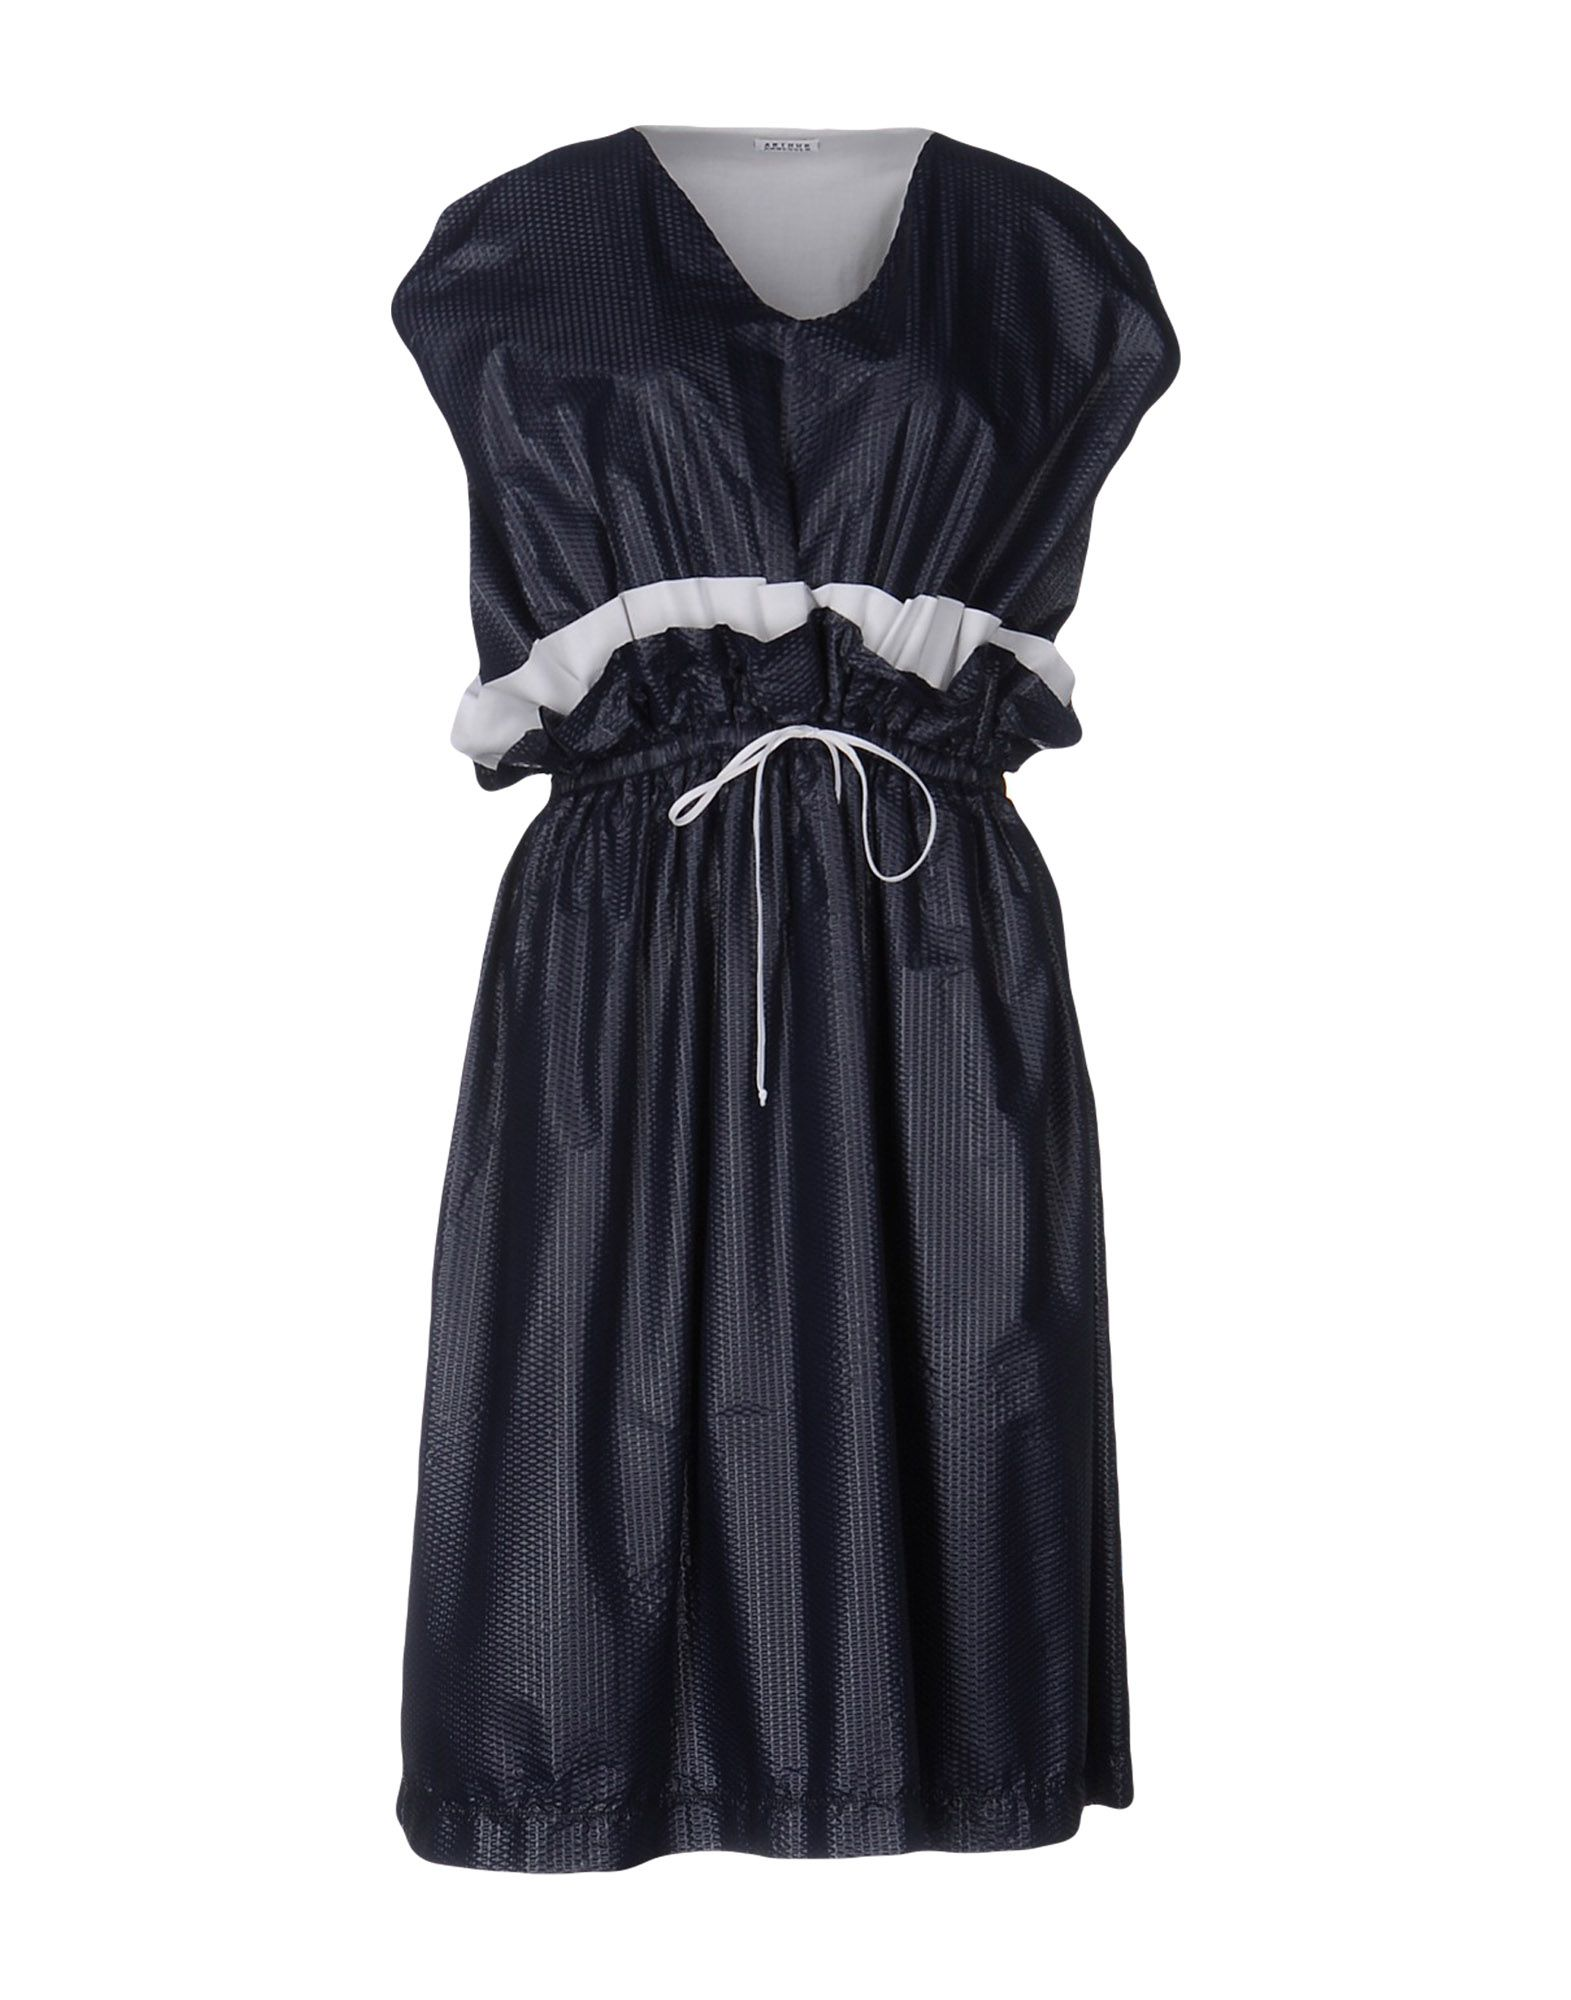 ARTHUR ARBESSER Midi Dress in Dark Blue